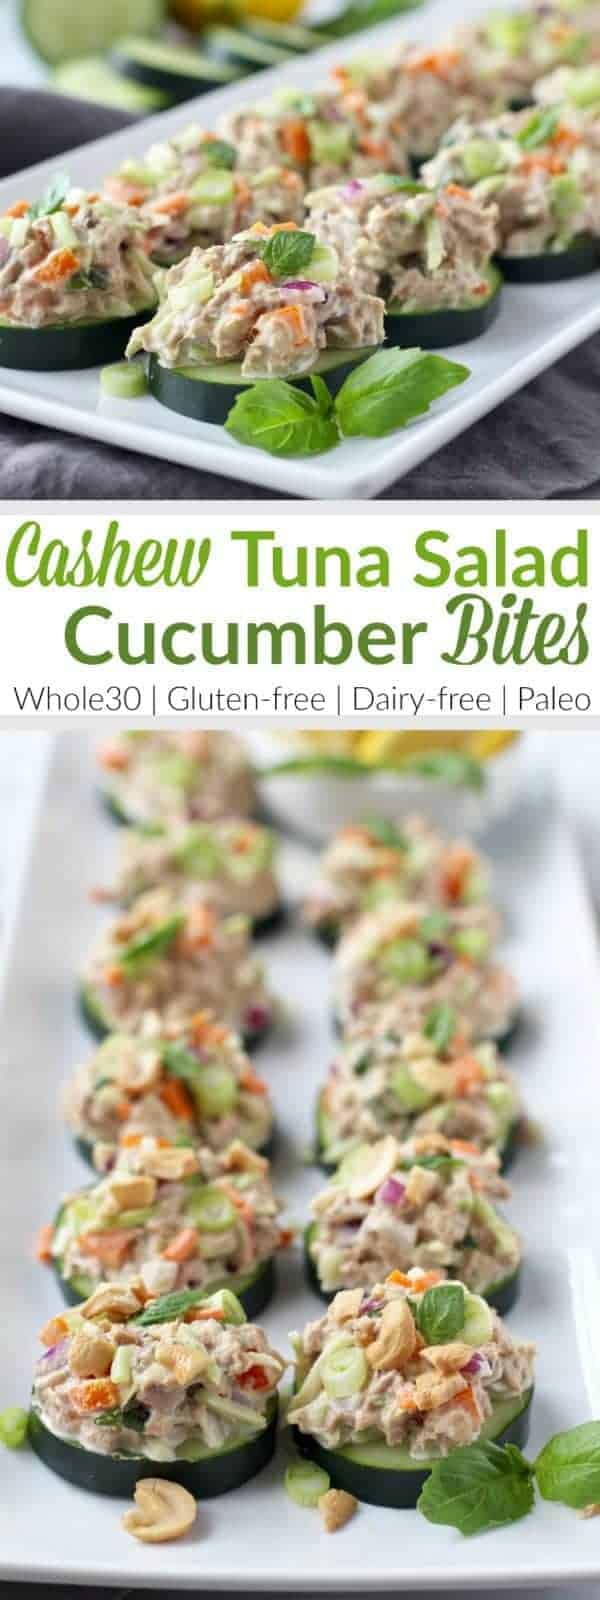 Pinterest image for Cashew Tuna Salad Cucumber Bites